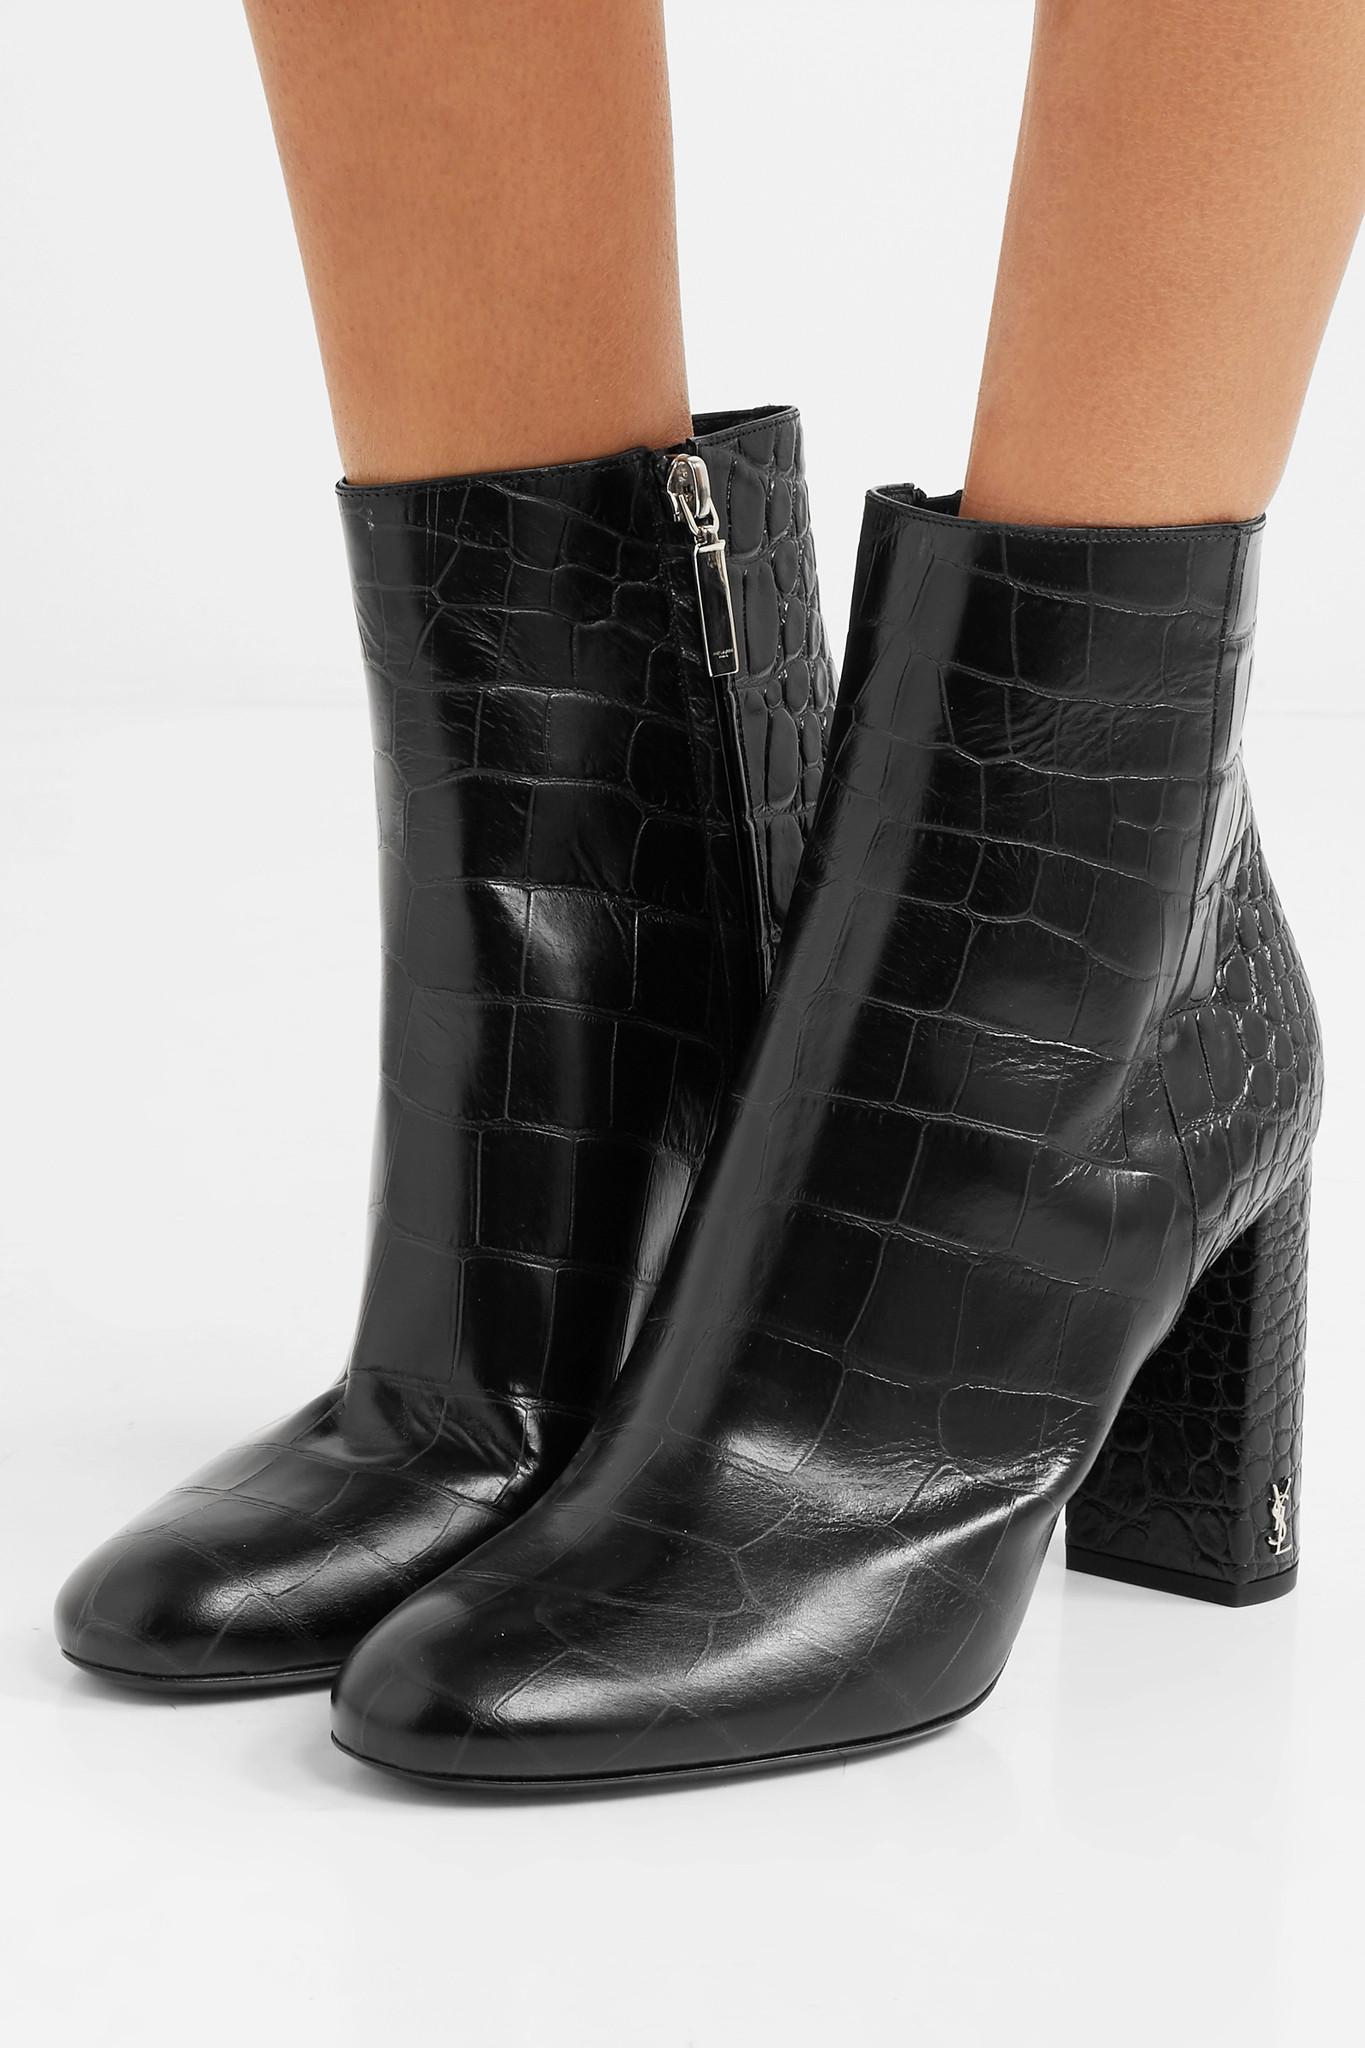 Saint Laurent Loulou Patent Leather Ankle Boots